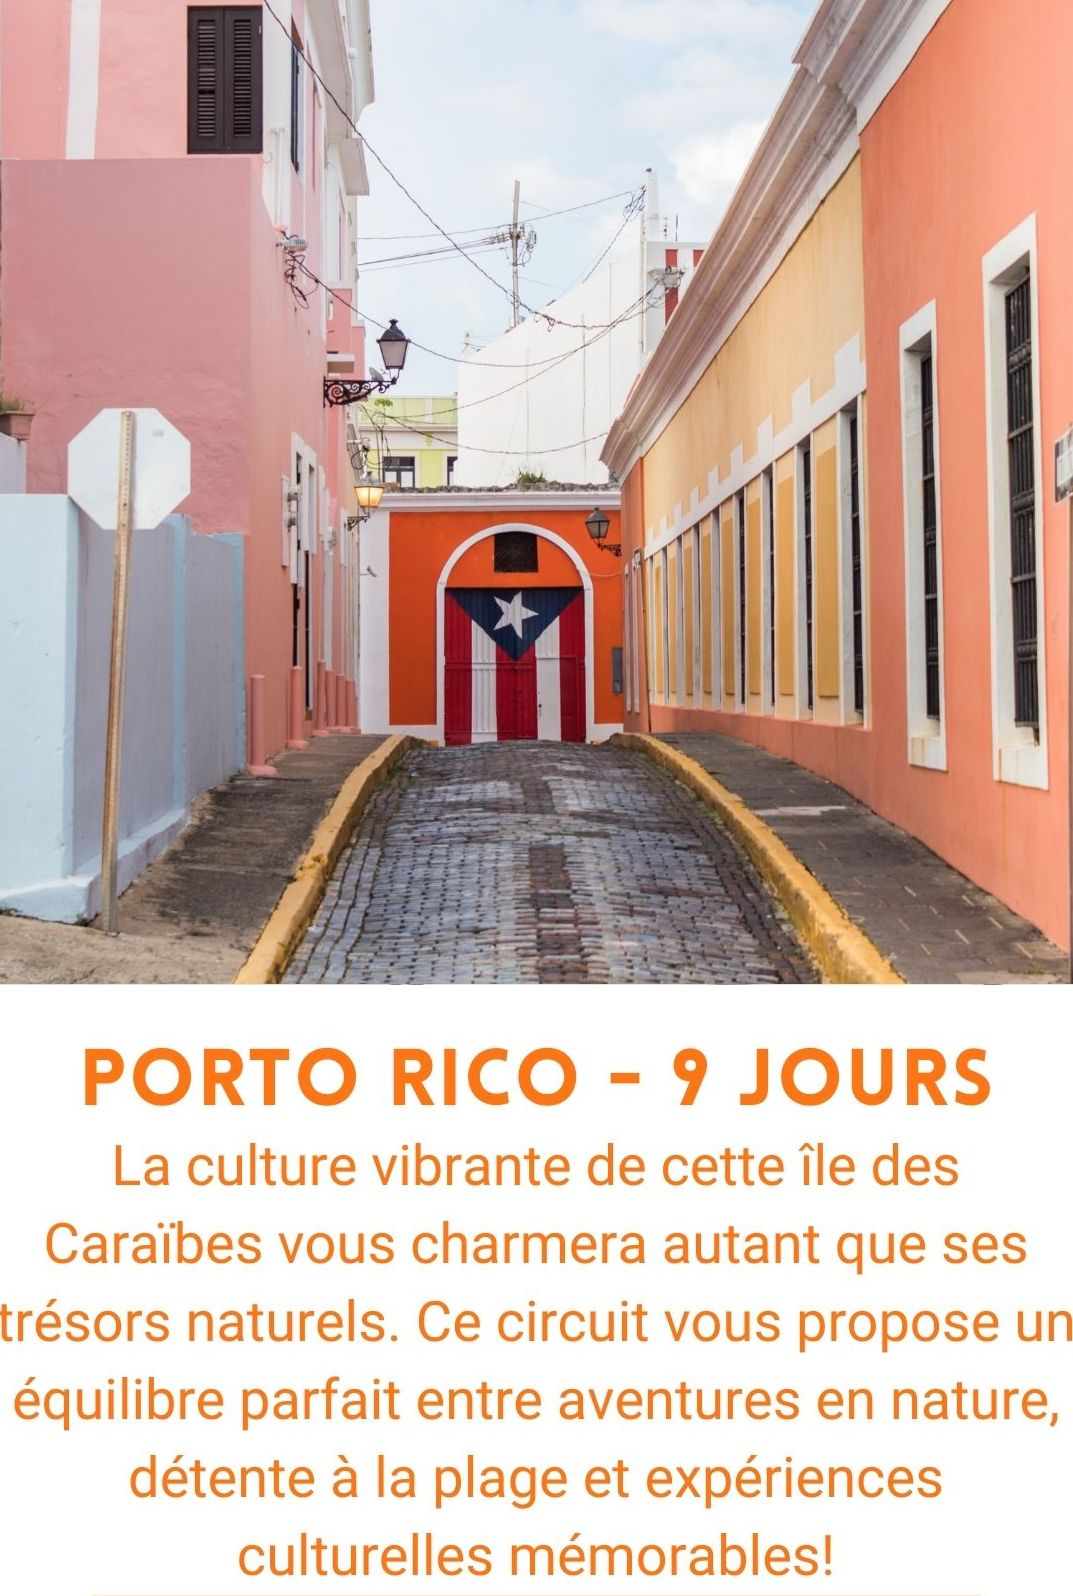 Voyage organisé à Porto Rico